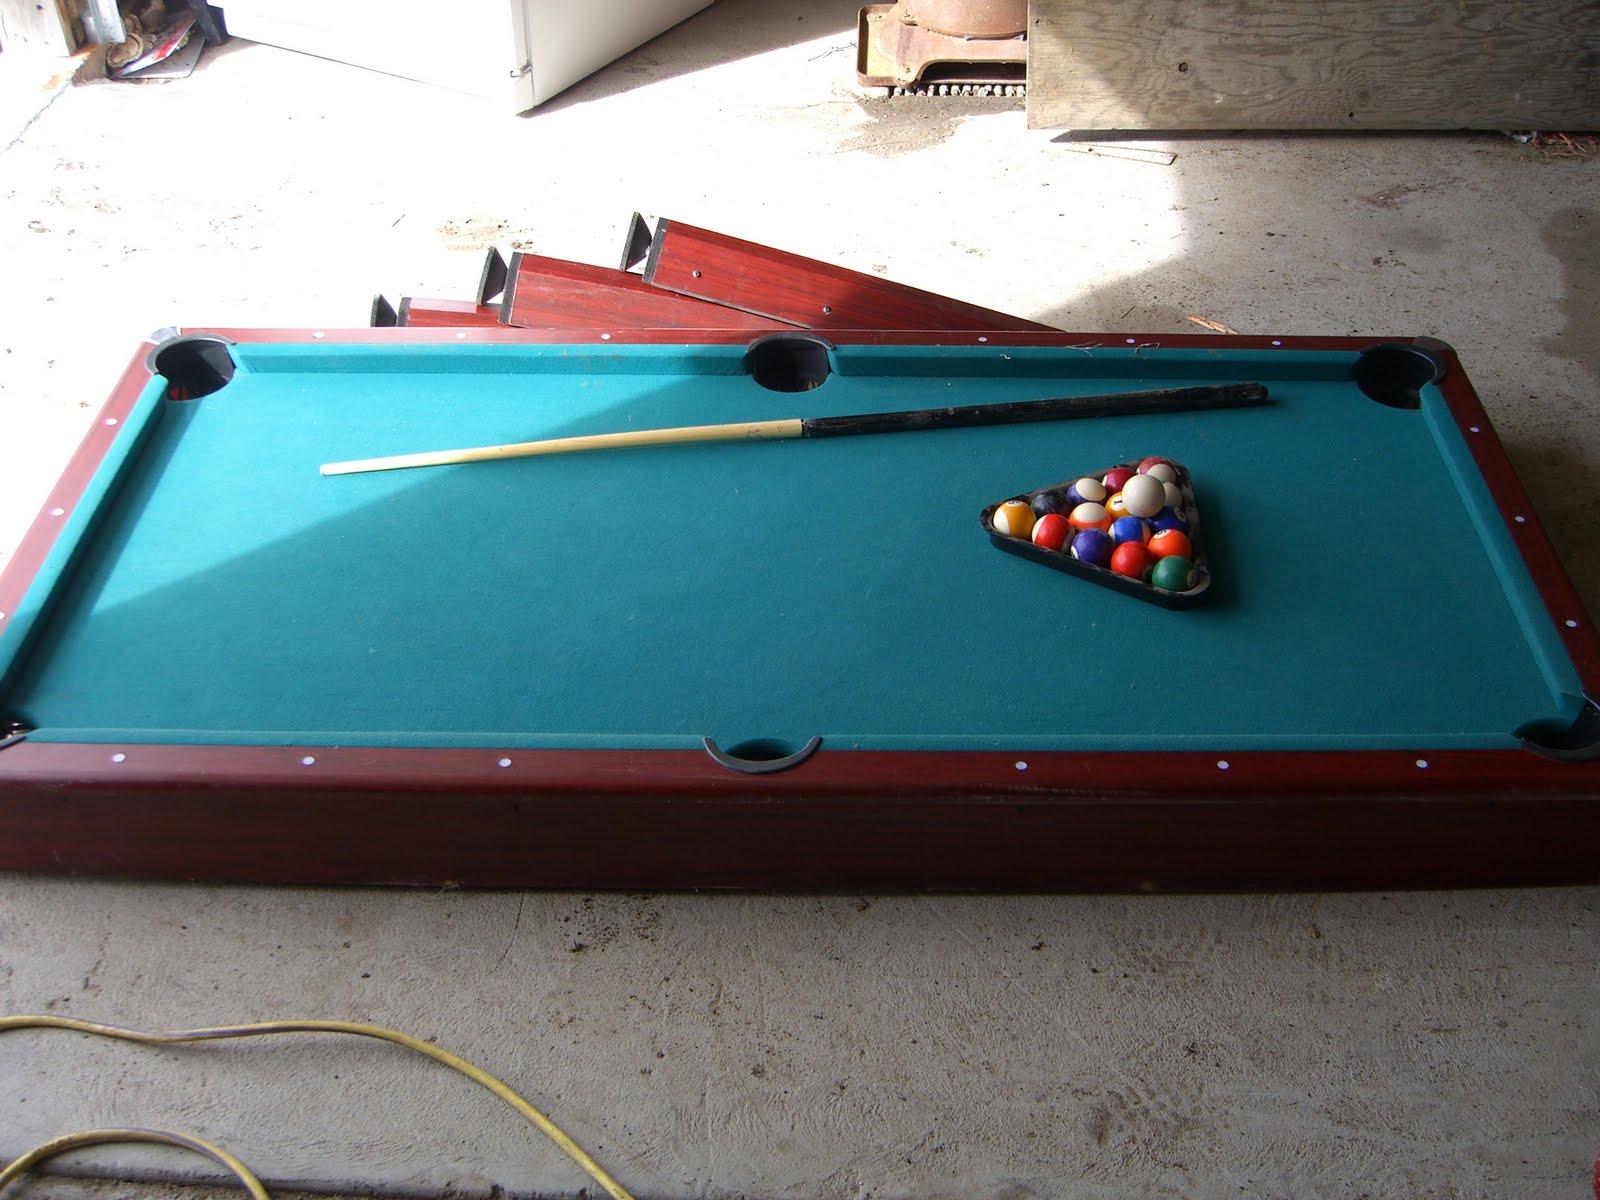 Superb Small Pool Table $30